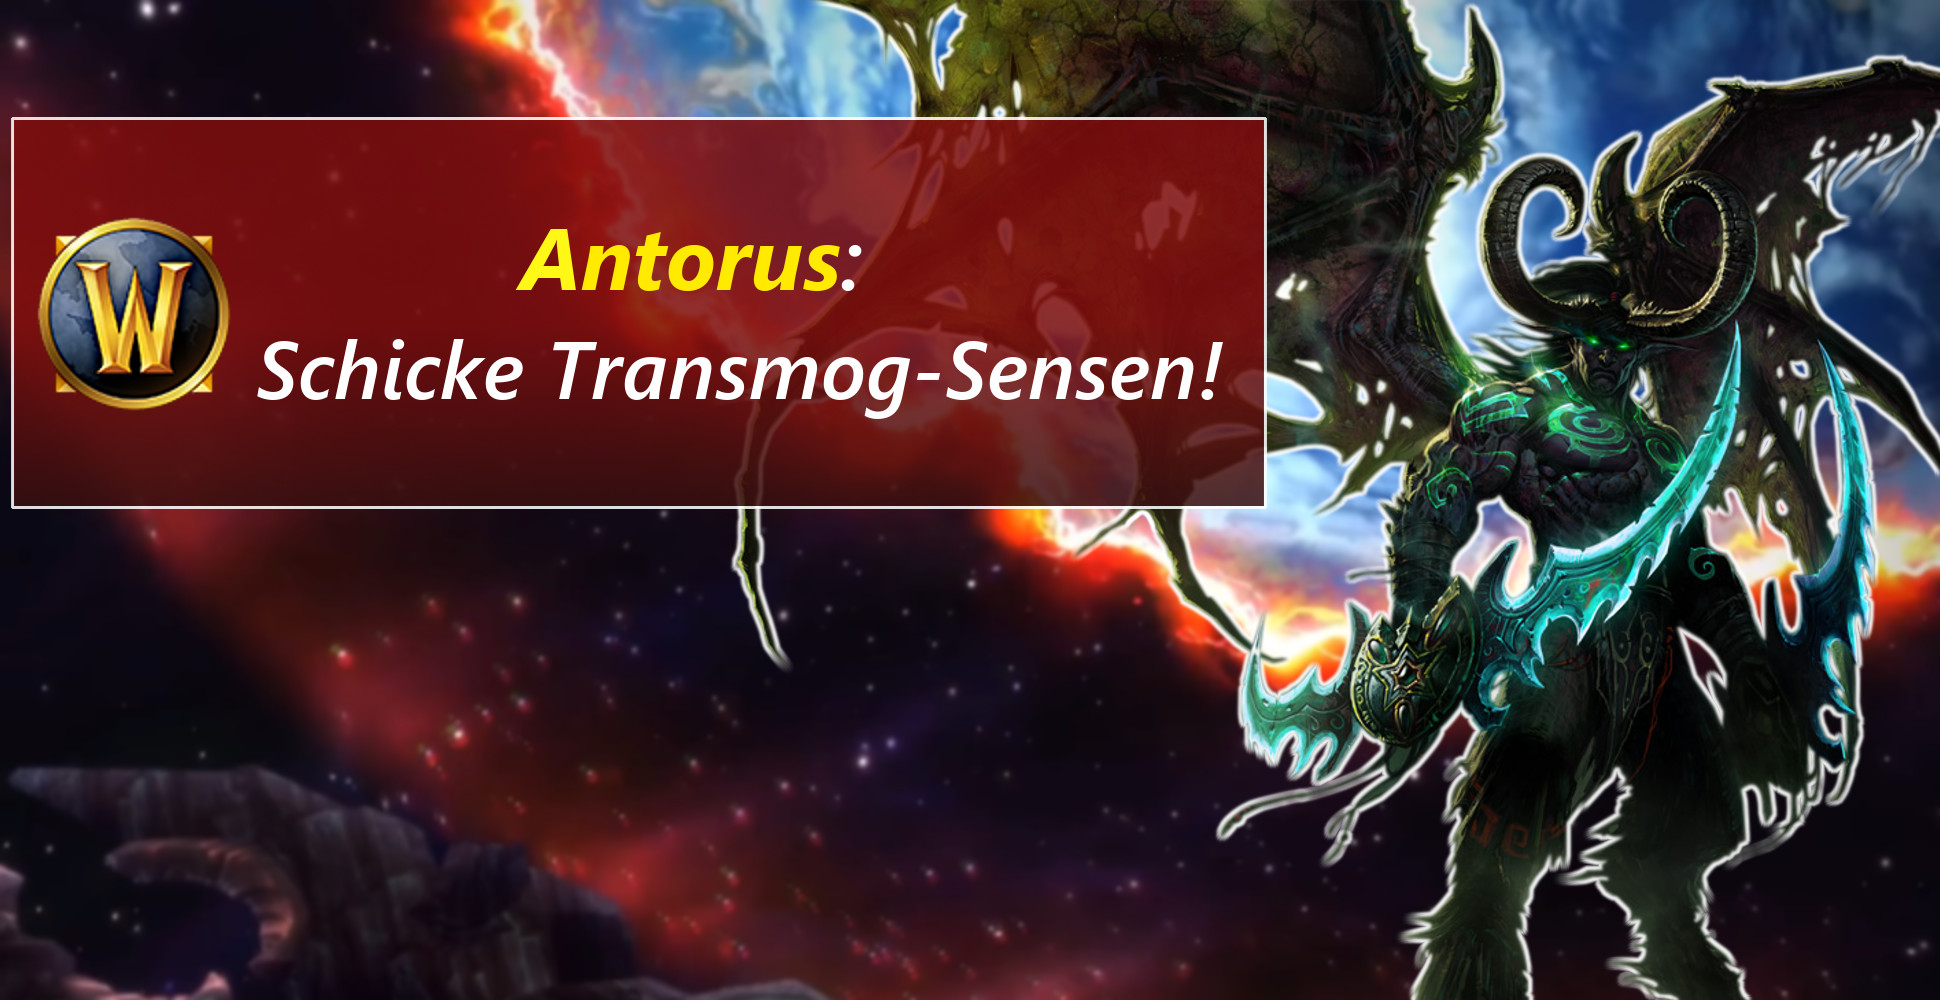 WoW: Scharfe Transmog-Sense aus dem letzten Legion-Raid!